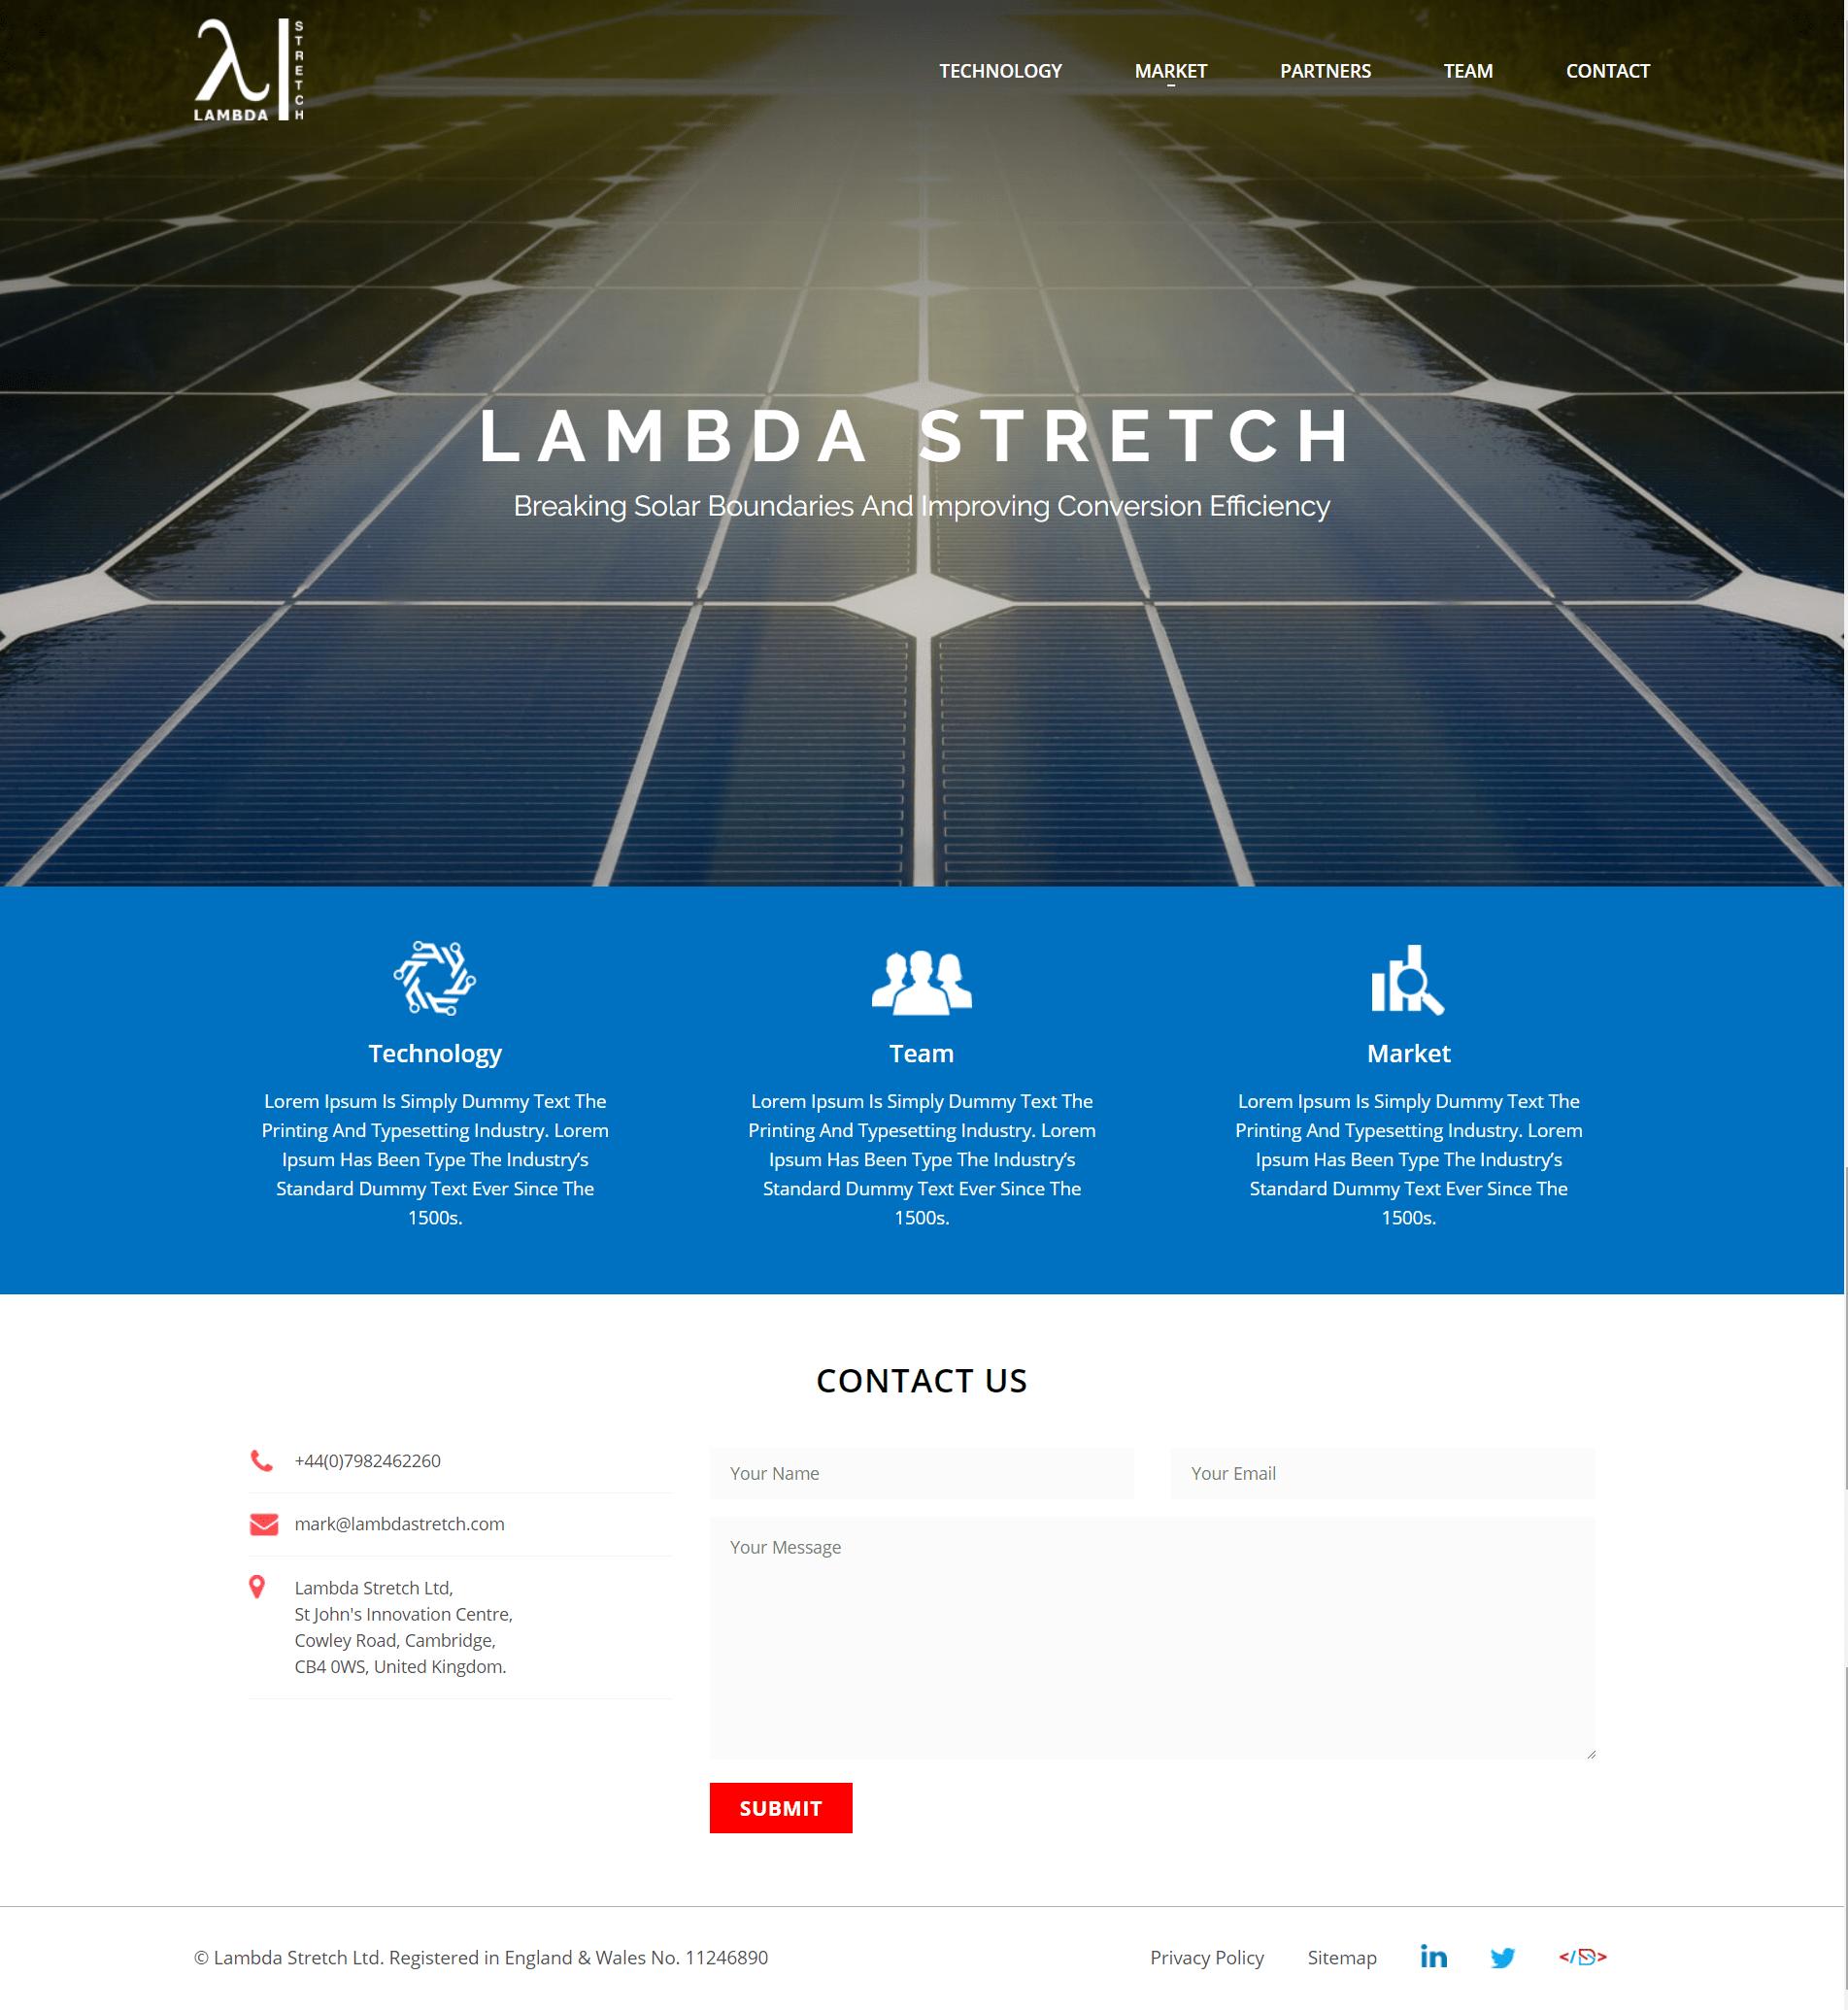 Lambda Stretch